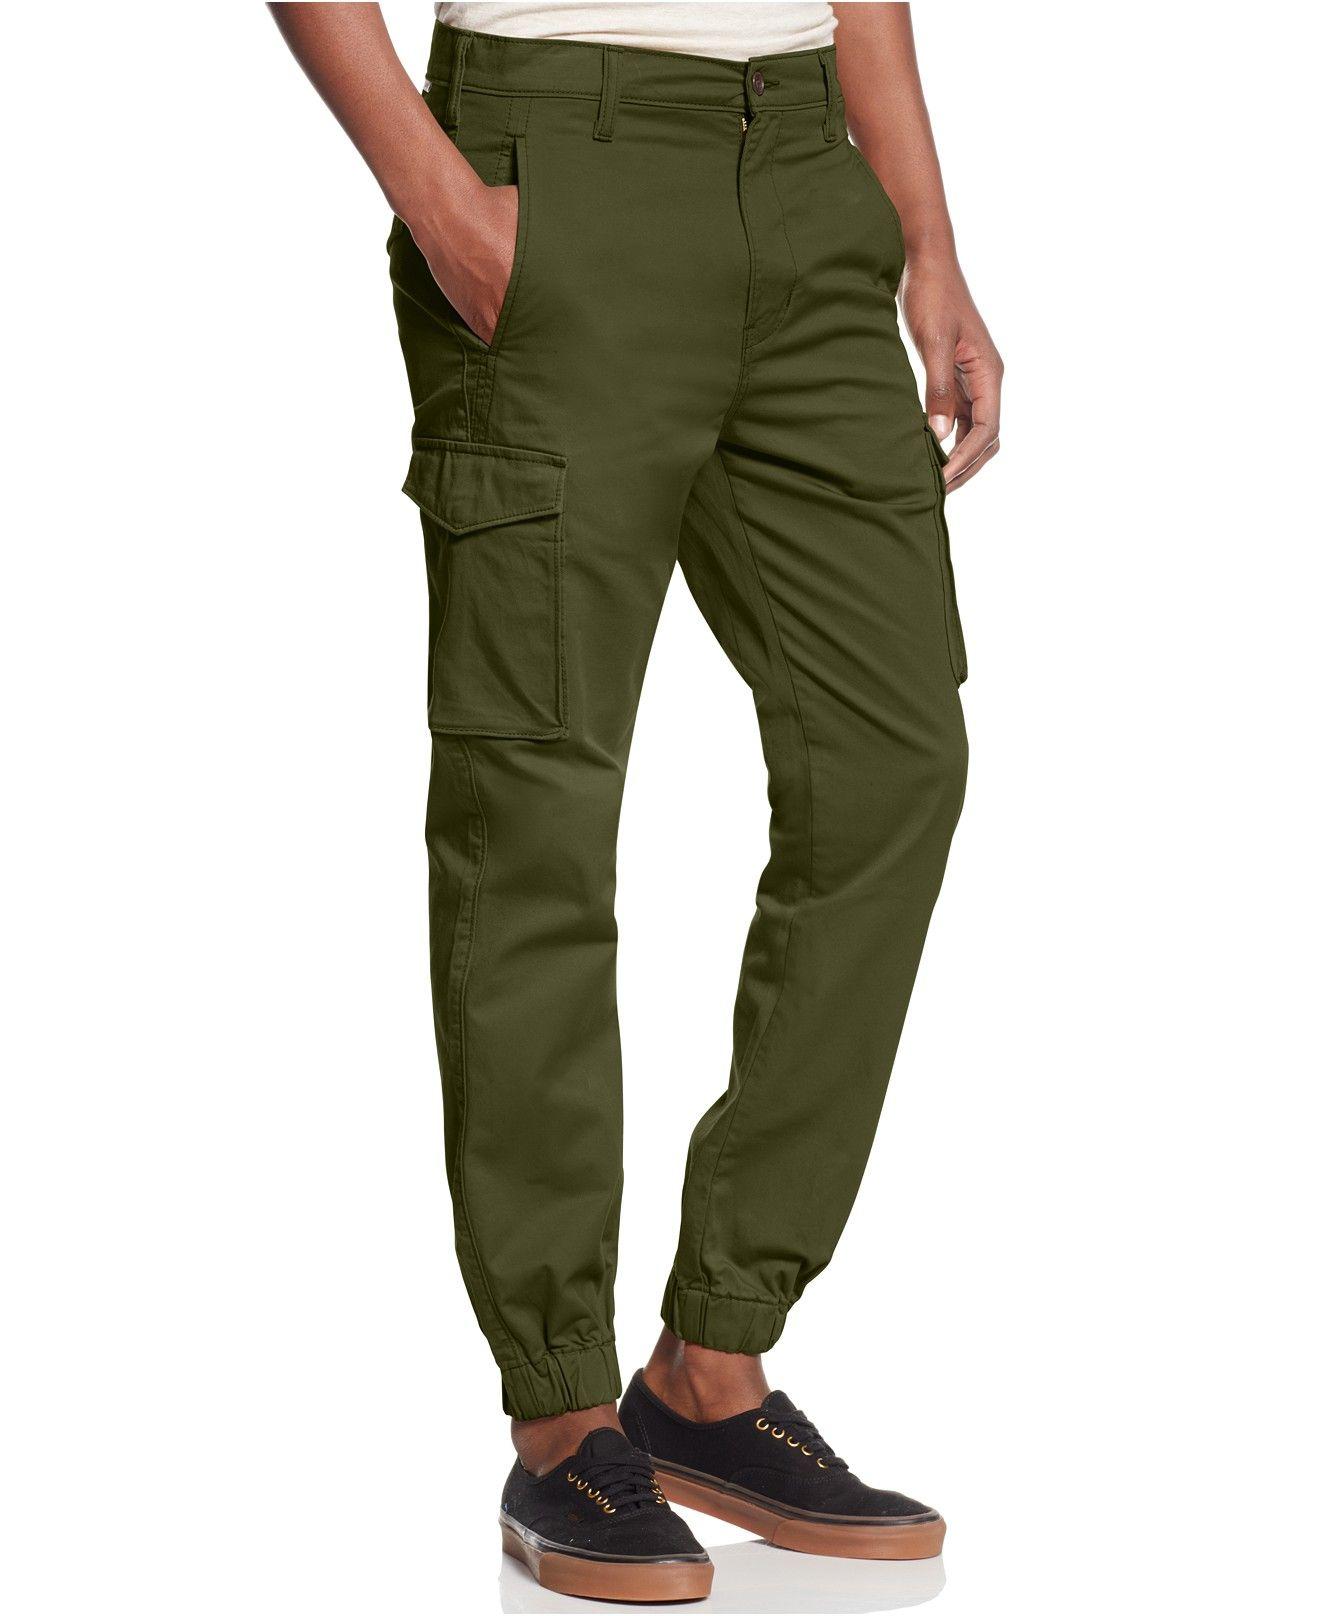 e71bcc5f42d0 Levi s Banded Cargo Jogger - Pants - Men - Macy s